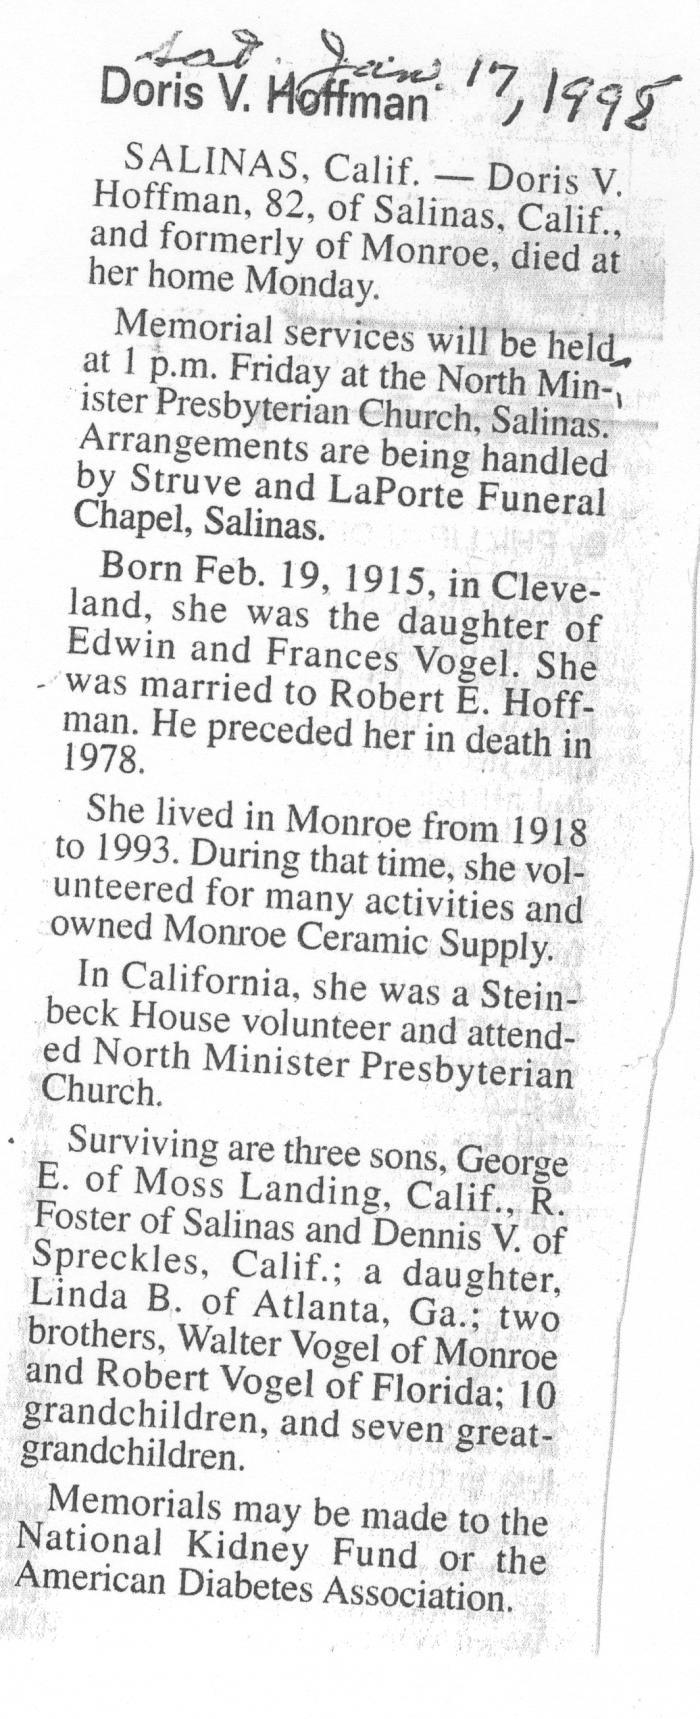 Obituary of Doris V. Hoffman born Feb.19, 1915 in Cleveland, Ohio. Resided in Monroe, Michigan and Salinas, California